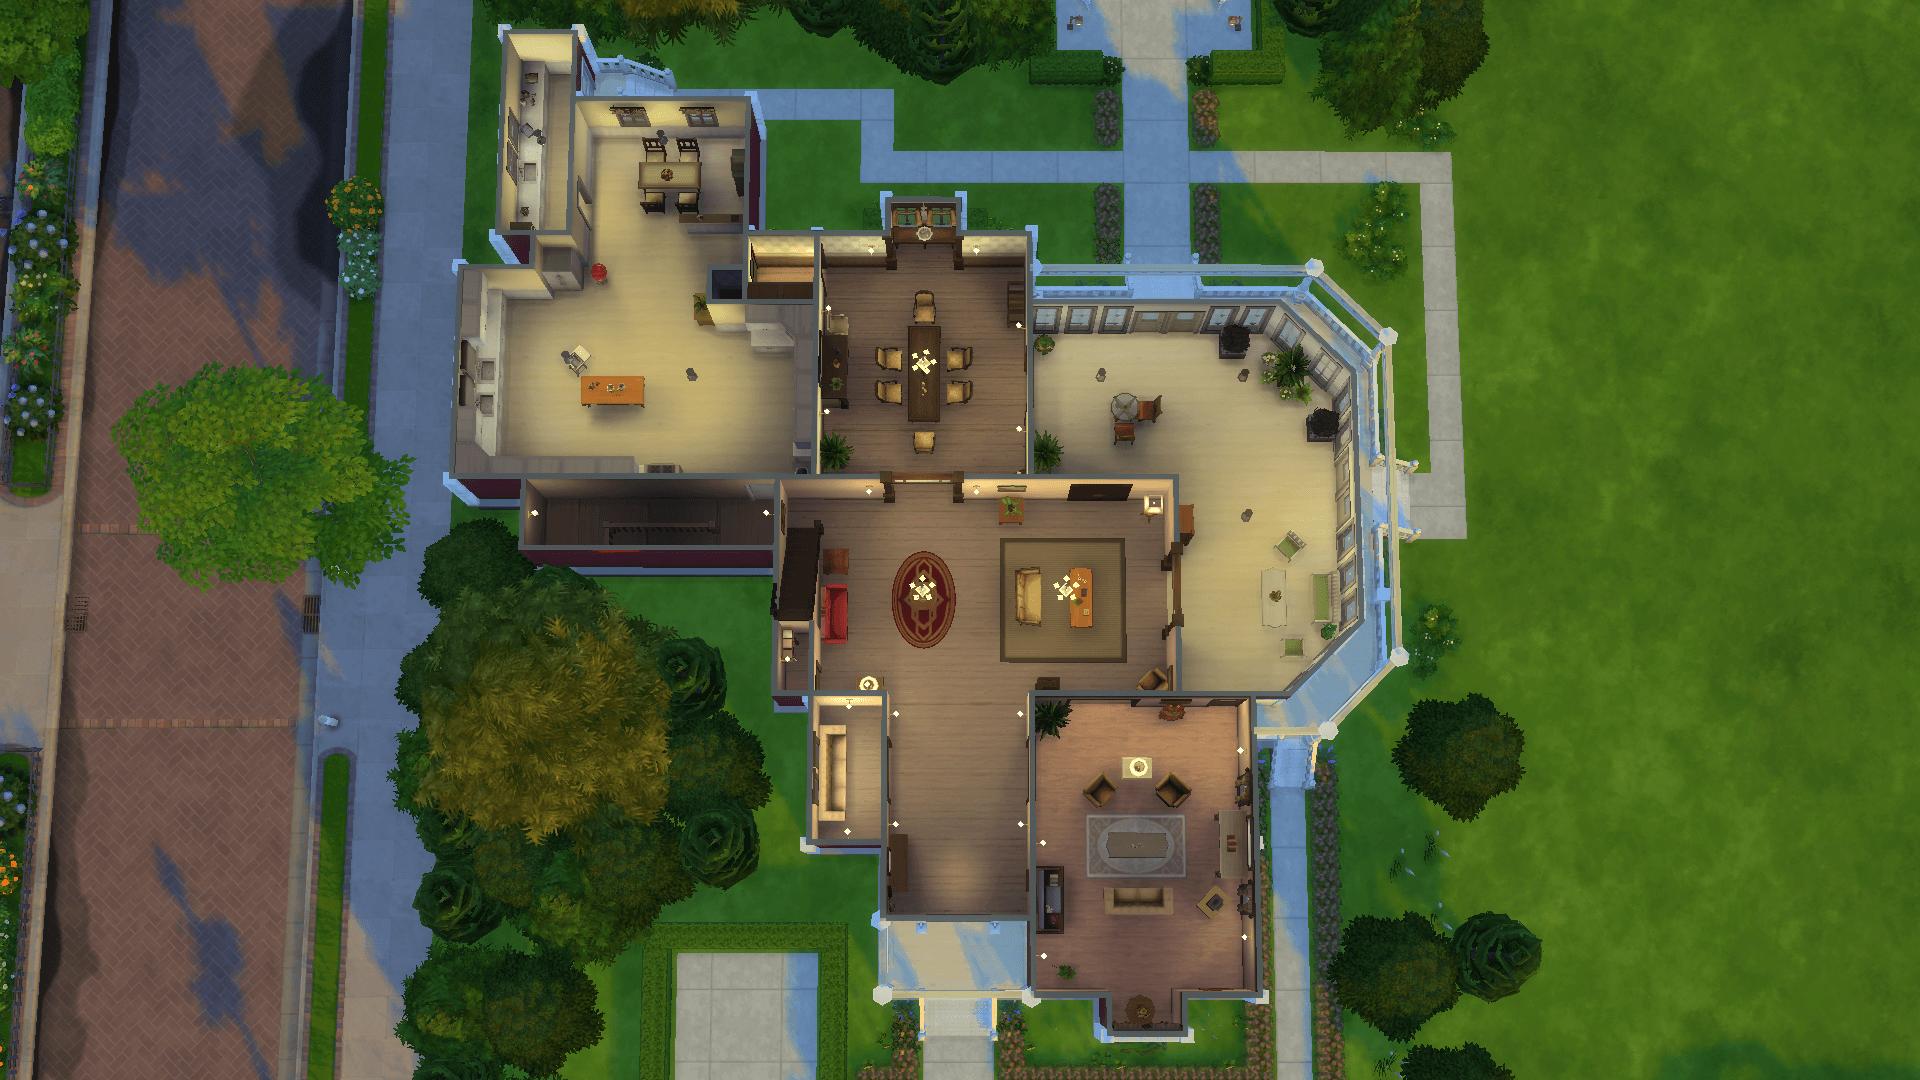 Mod The Sims - Halliwell Manor: No CC